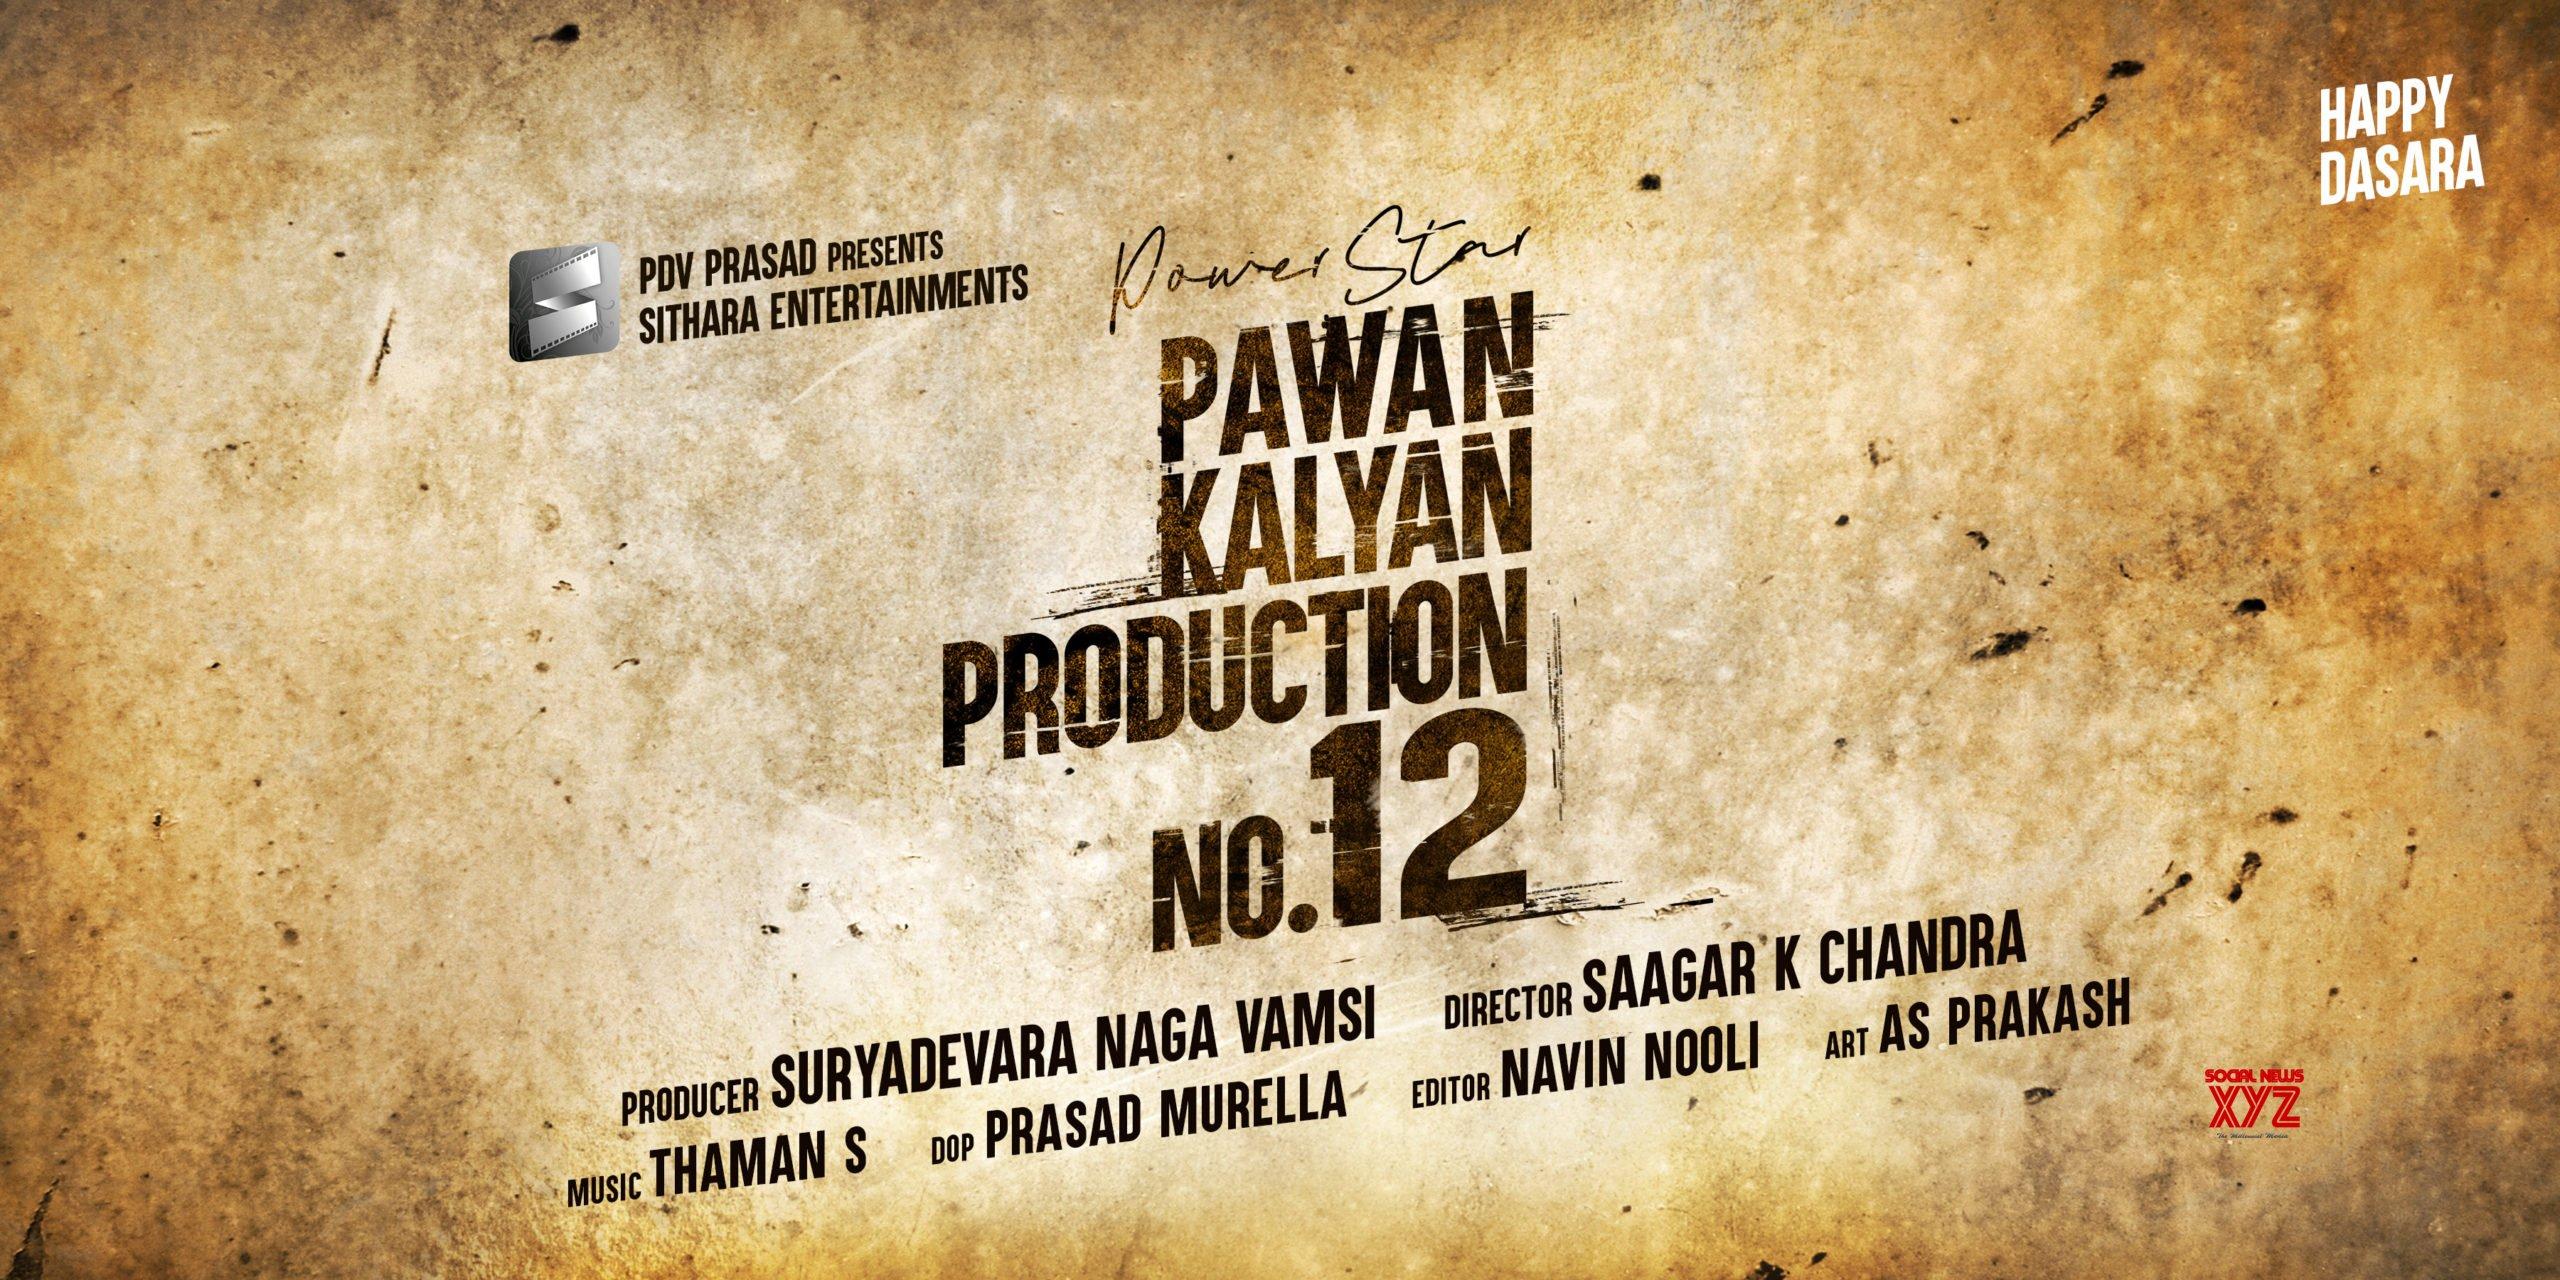 Power Star Pawan Kalyan In Sithara Entertainments Production No 12 Announced